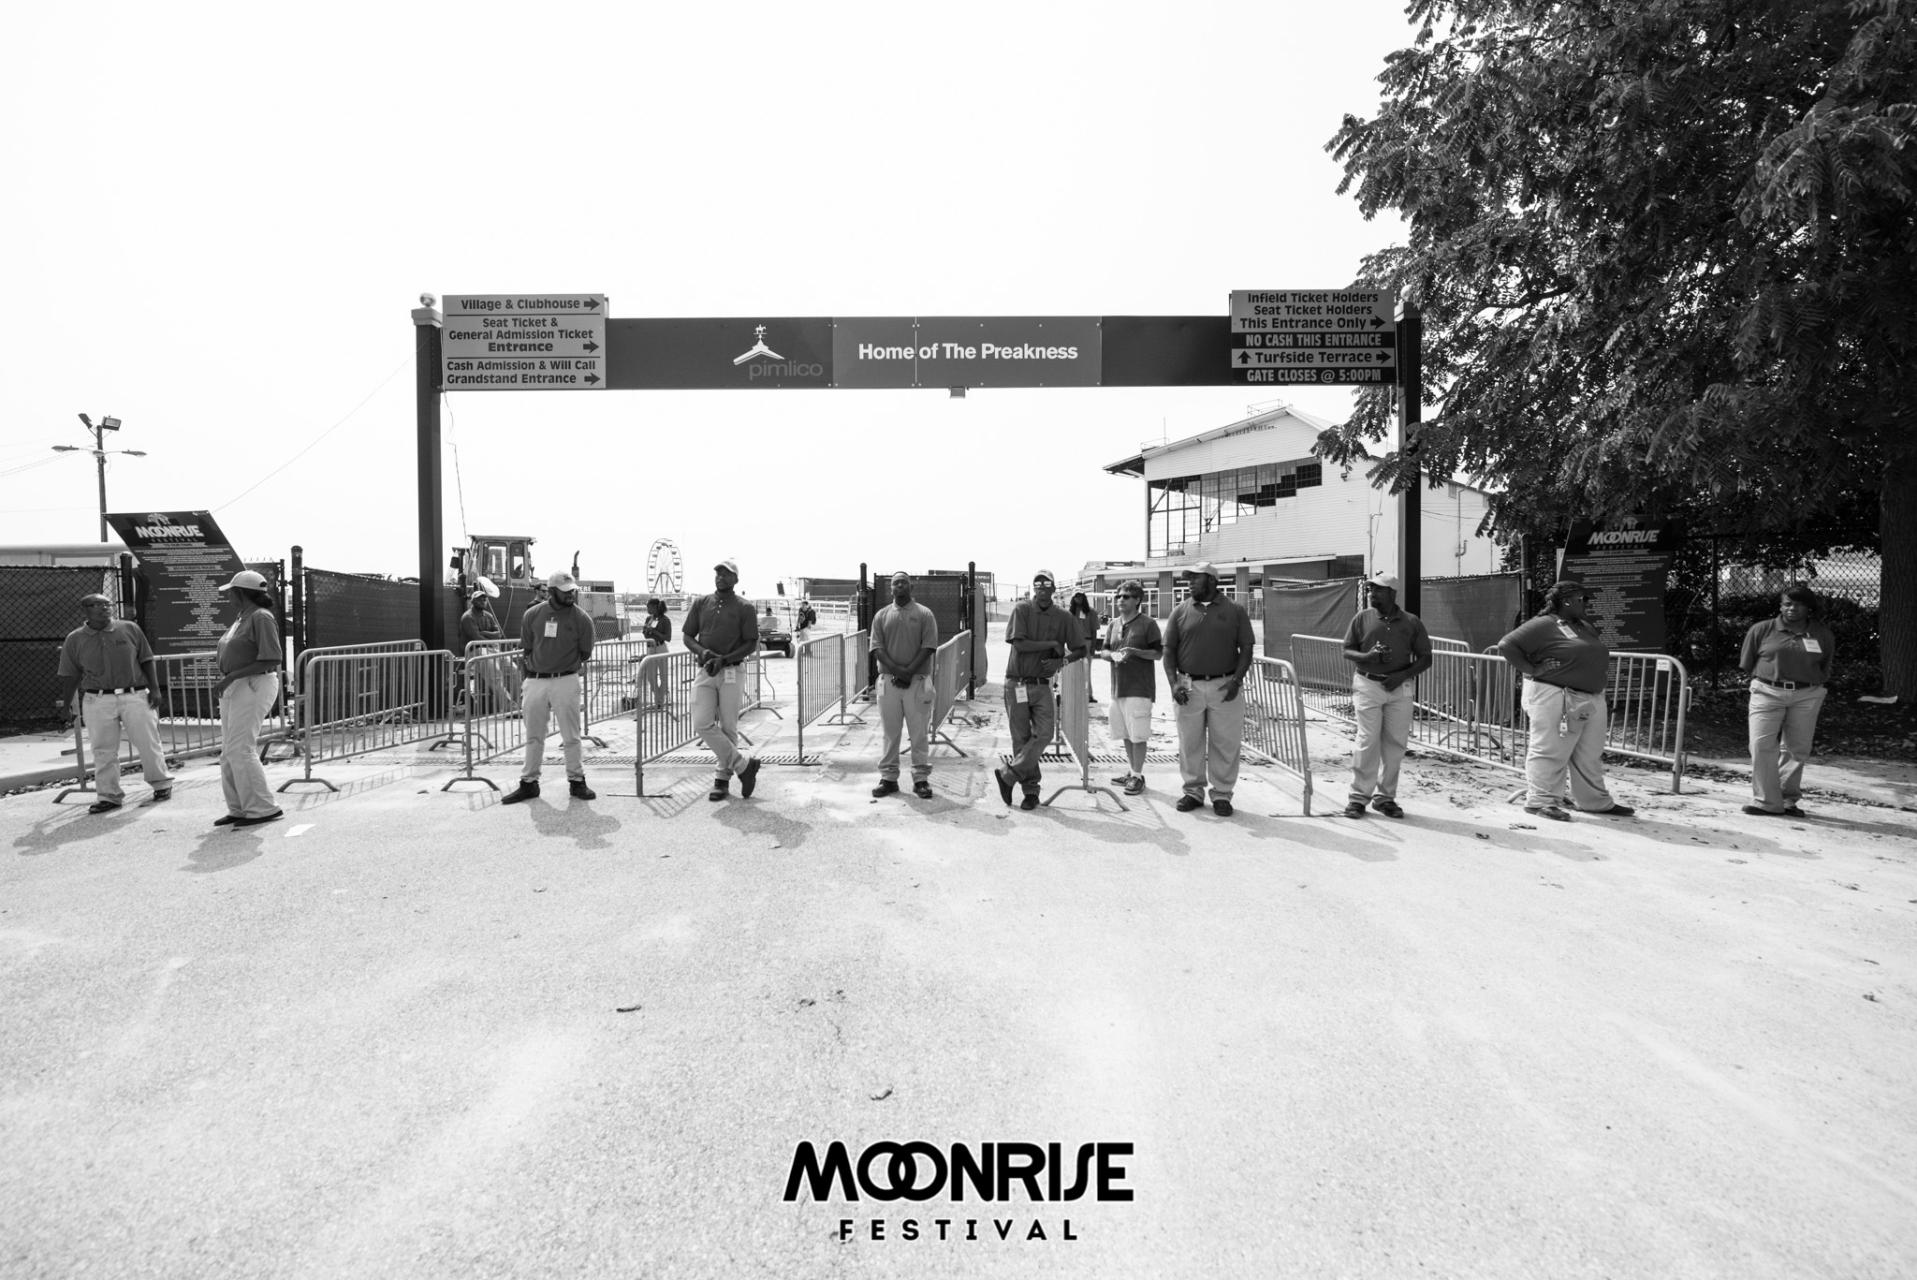 Moonrise_day1-1